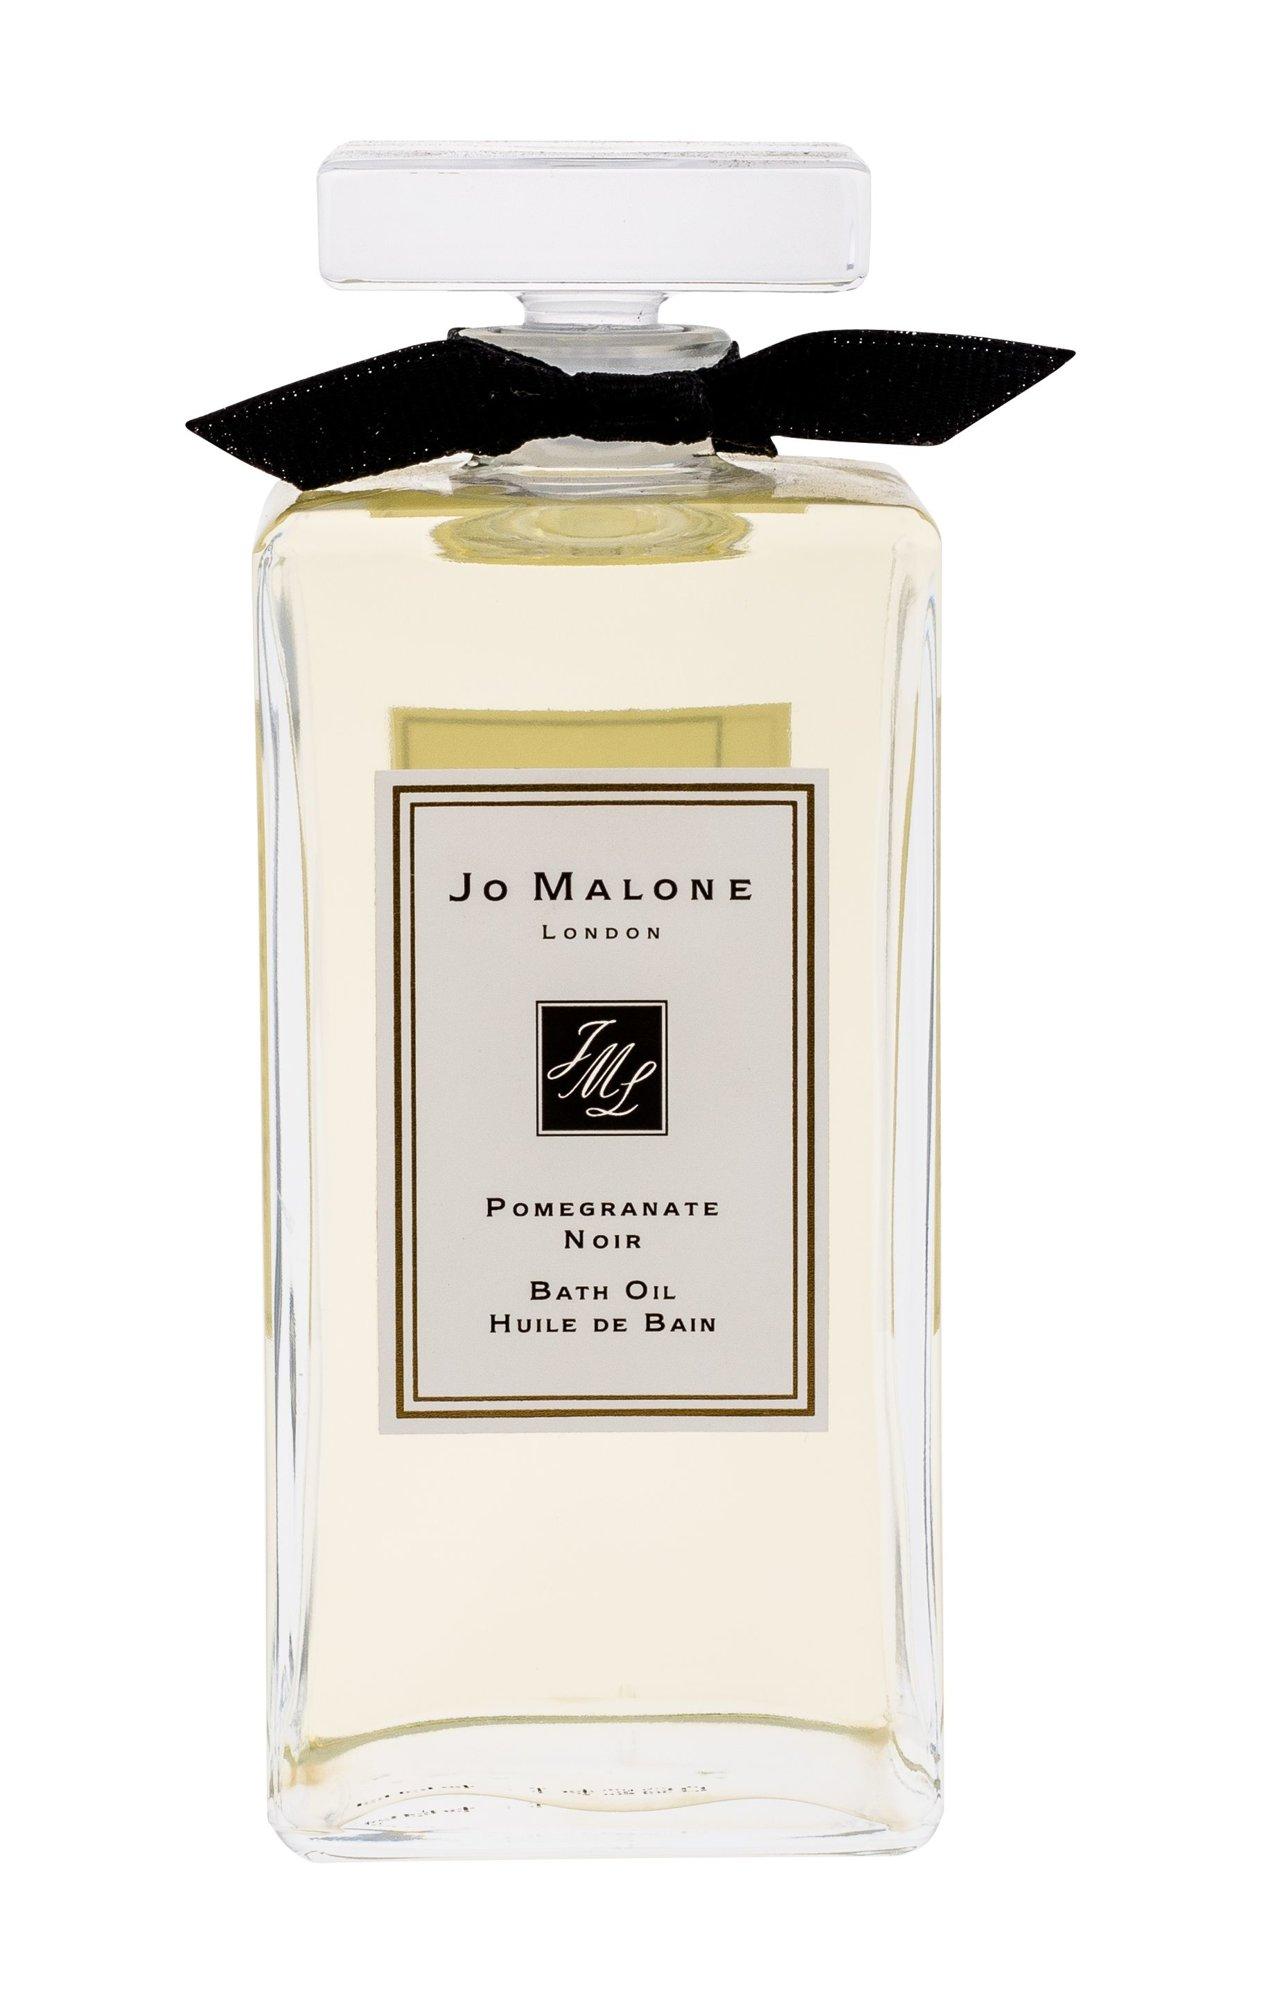 Jo Malone Pomegranate Noir Shower Oil 200ml